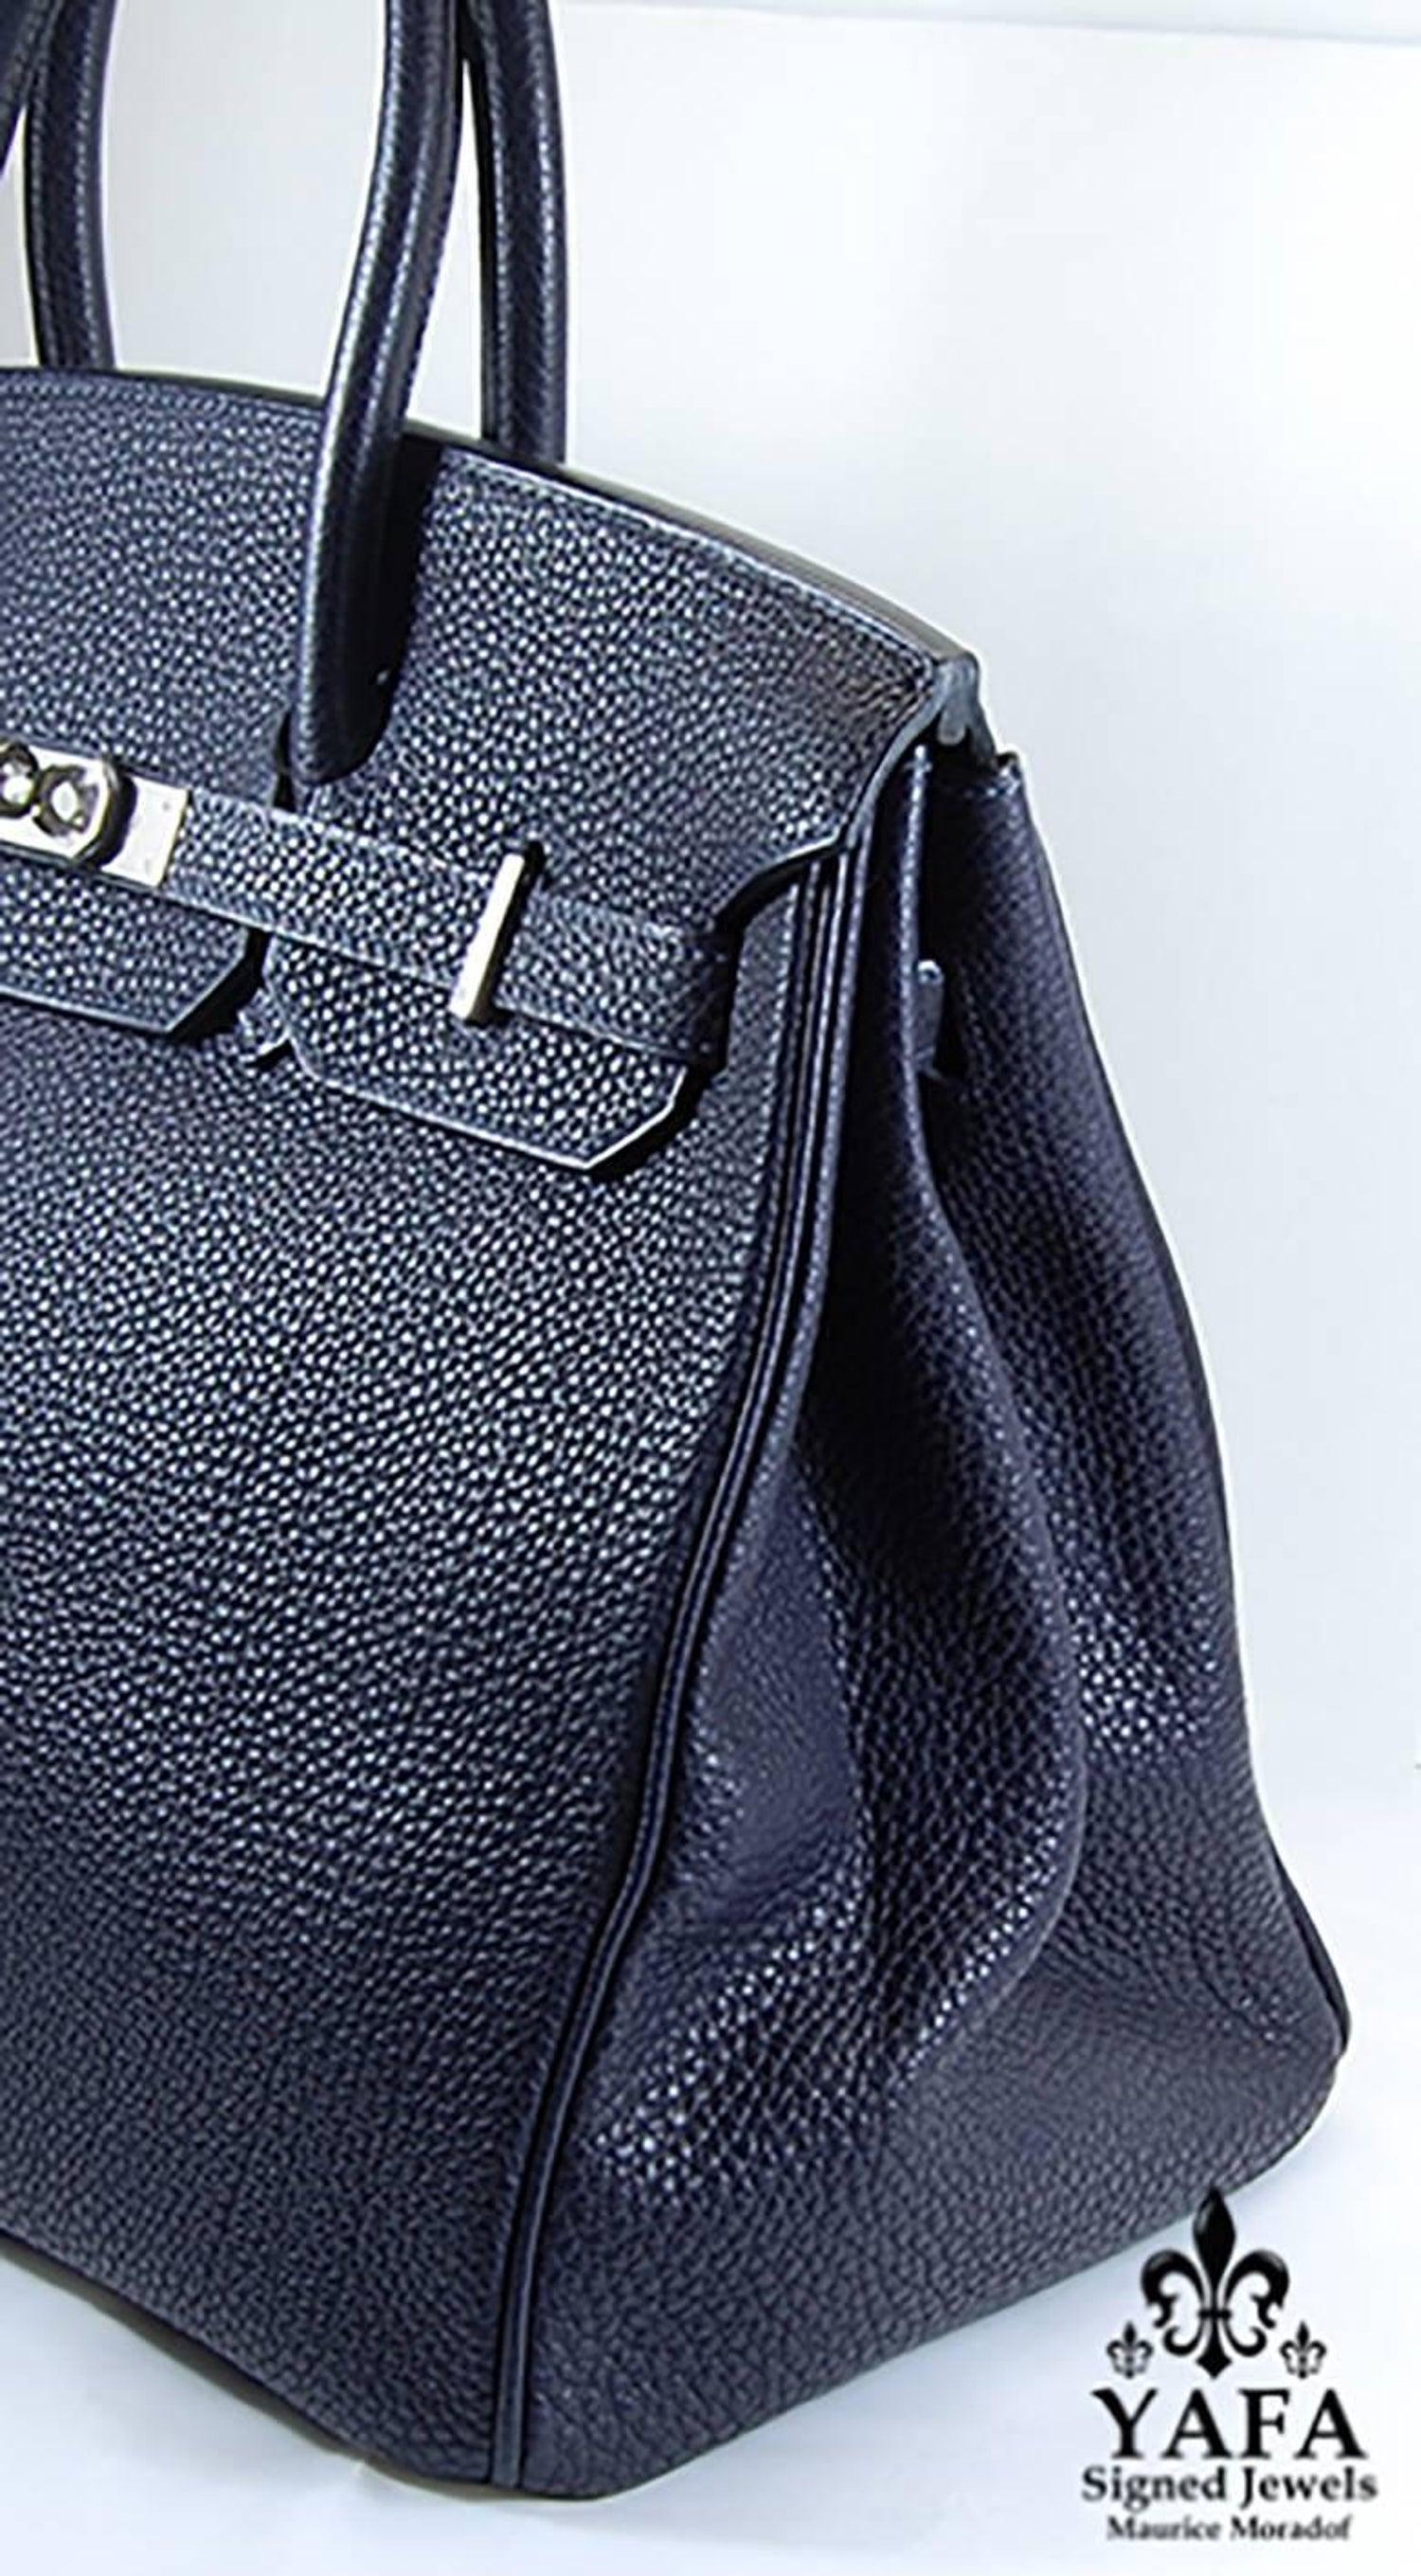 78697e04bc4 HERMES 35cm Navy Blue Birkin Bag at 1stdibs